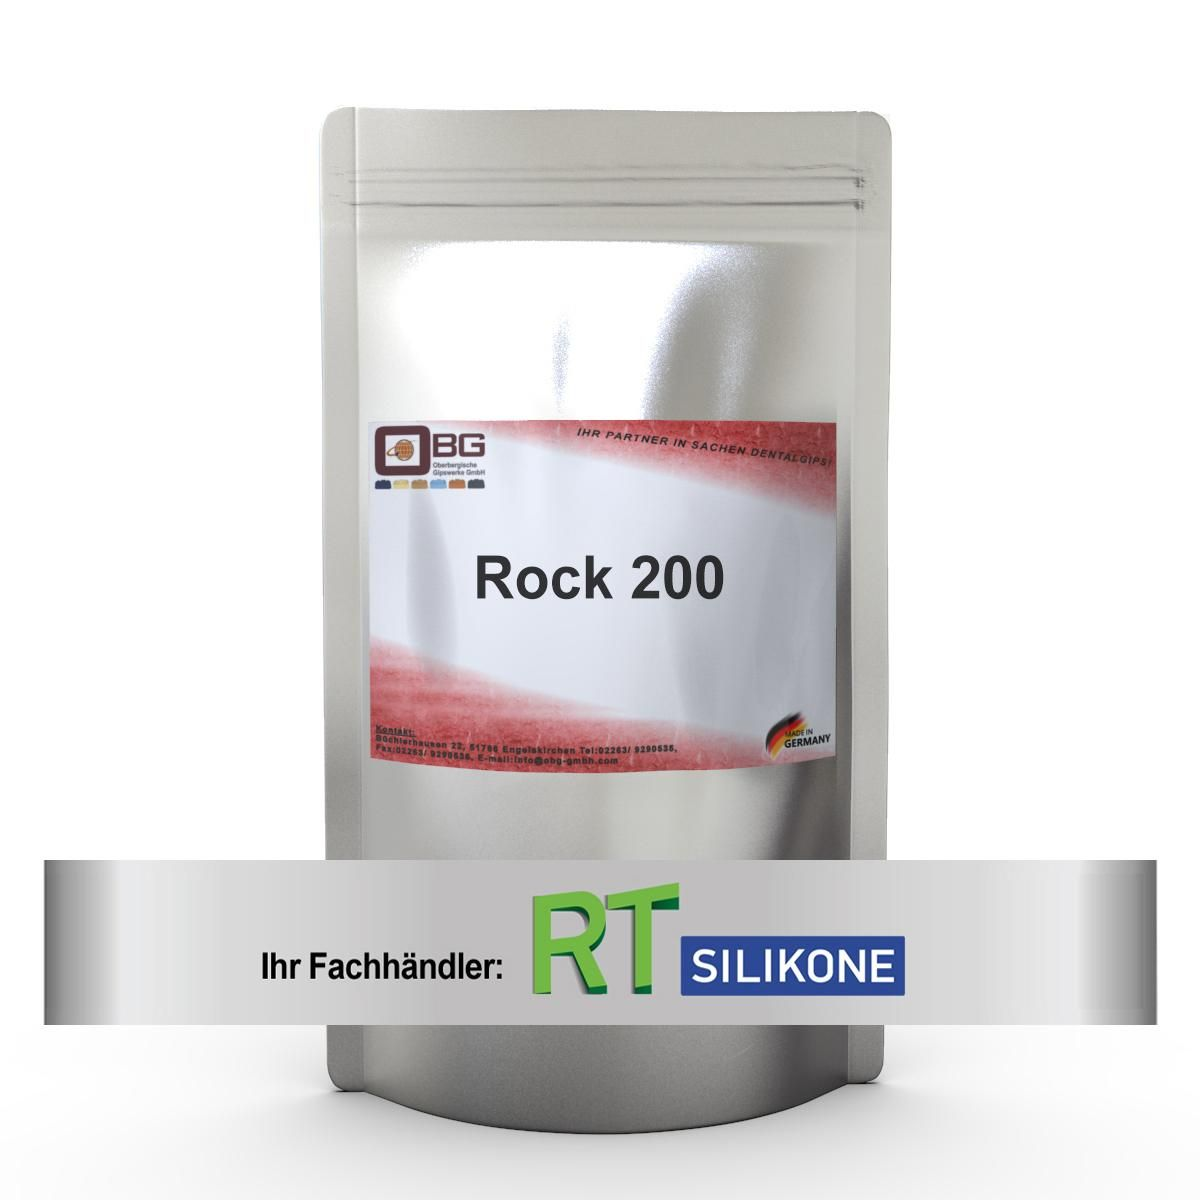 Rock 200 Zahnkranzgips goldbraun 5:1